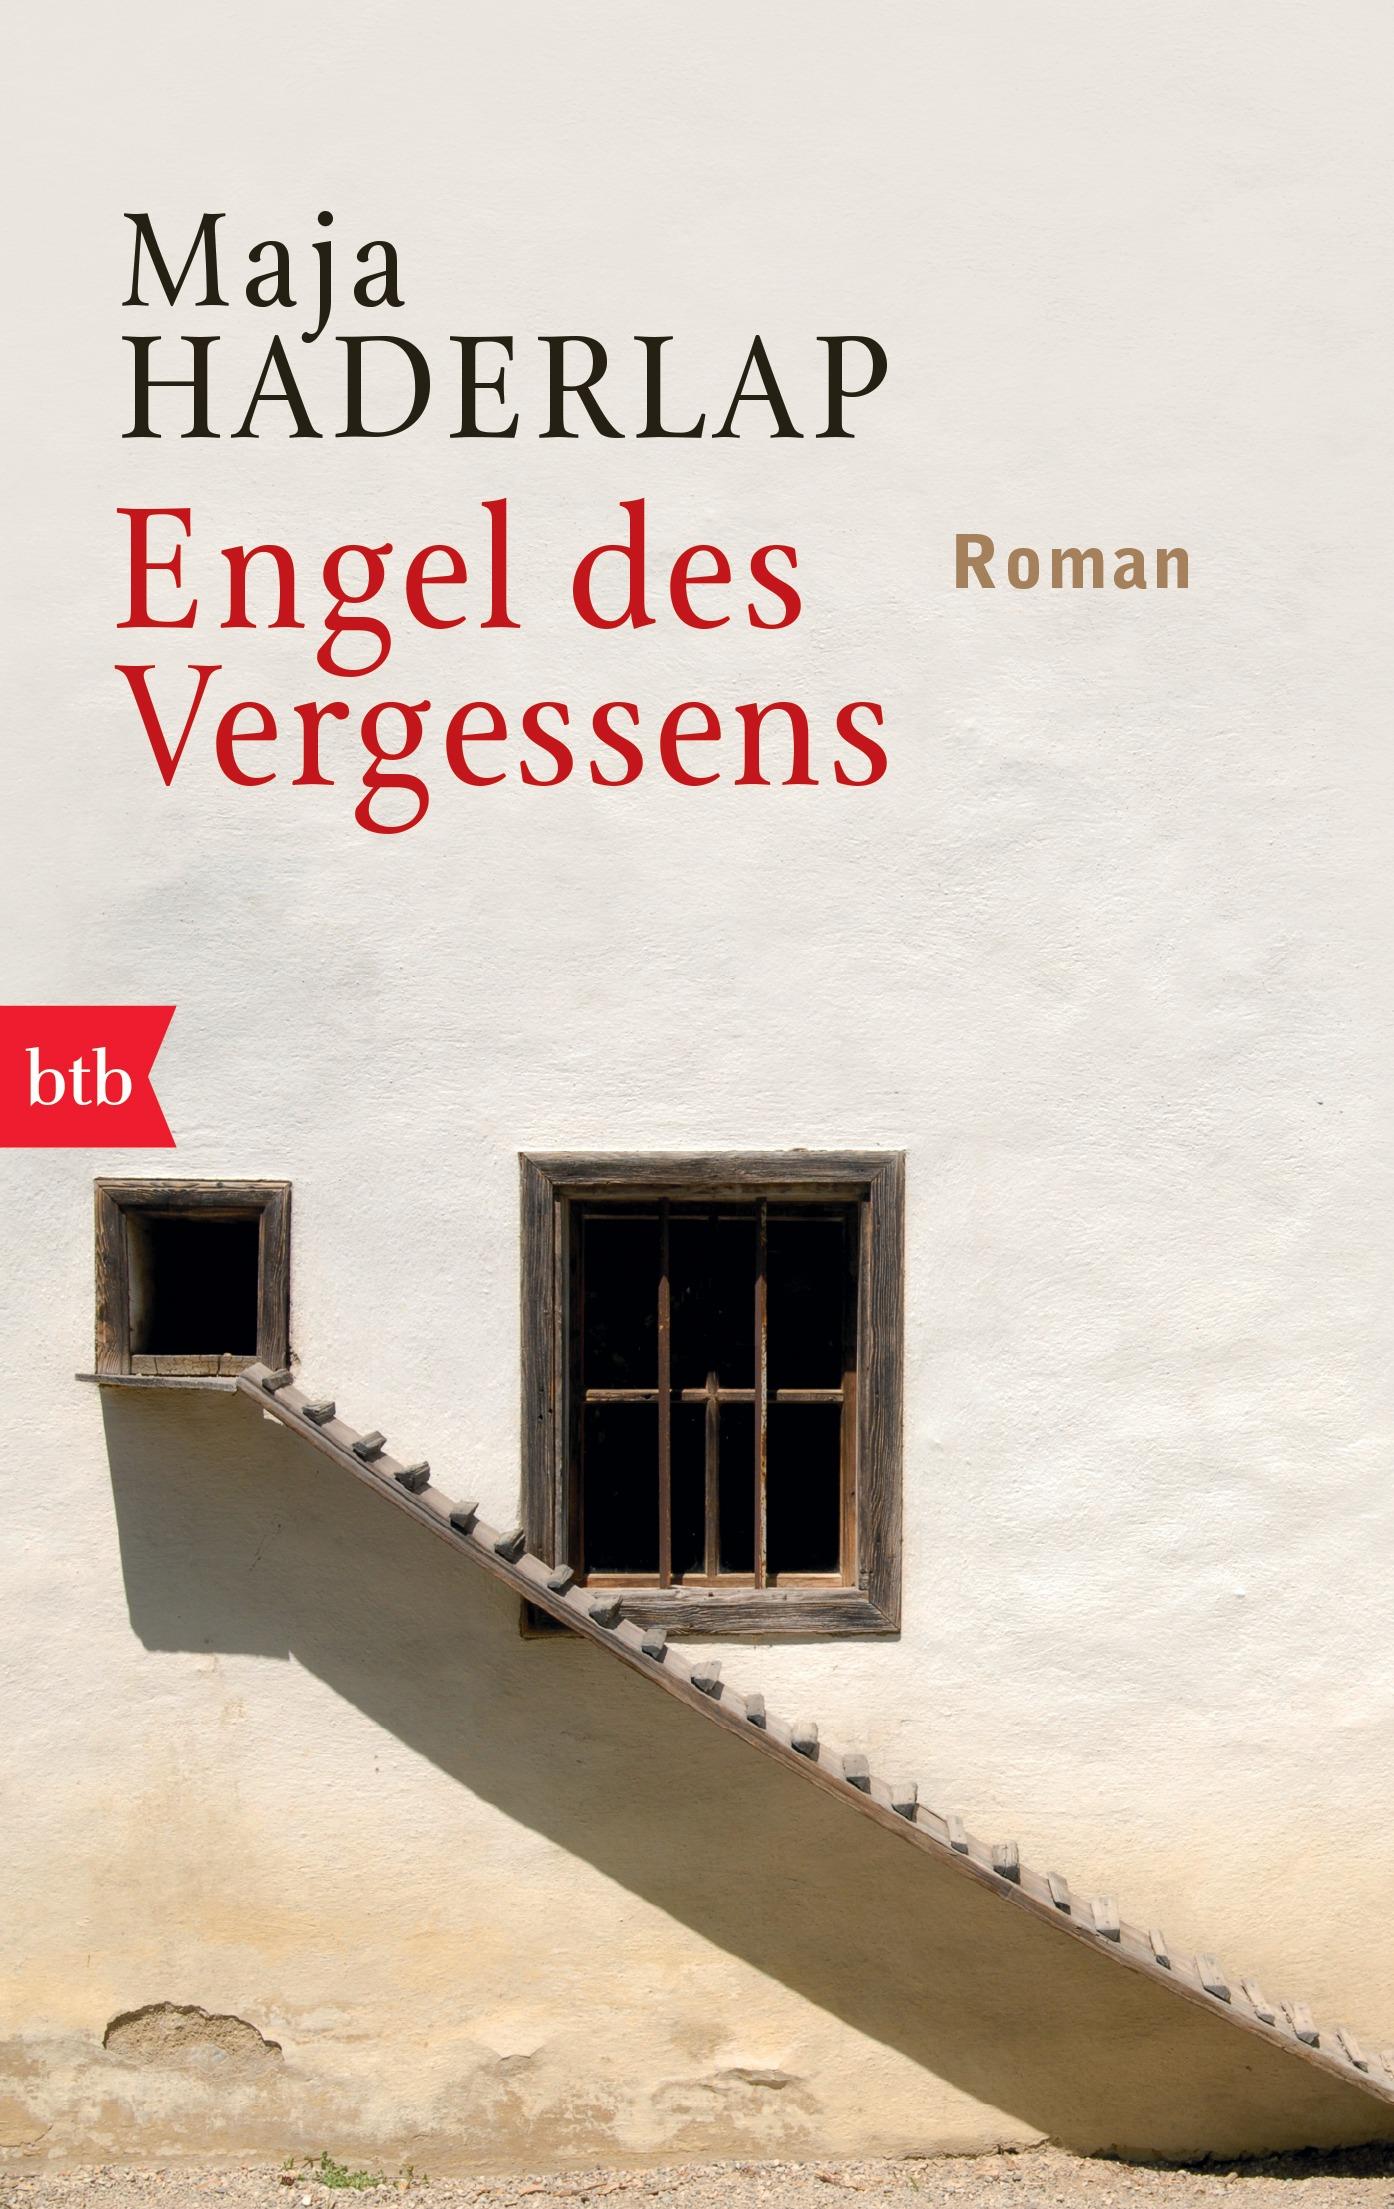 Engel des Vergessens von Maja Haderlap Parkbuchhandlung Buchhandlung Bonn Bad Godesberg